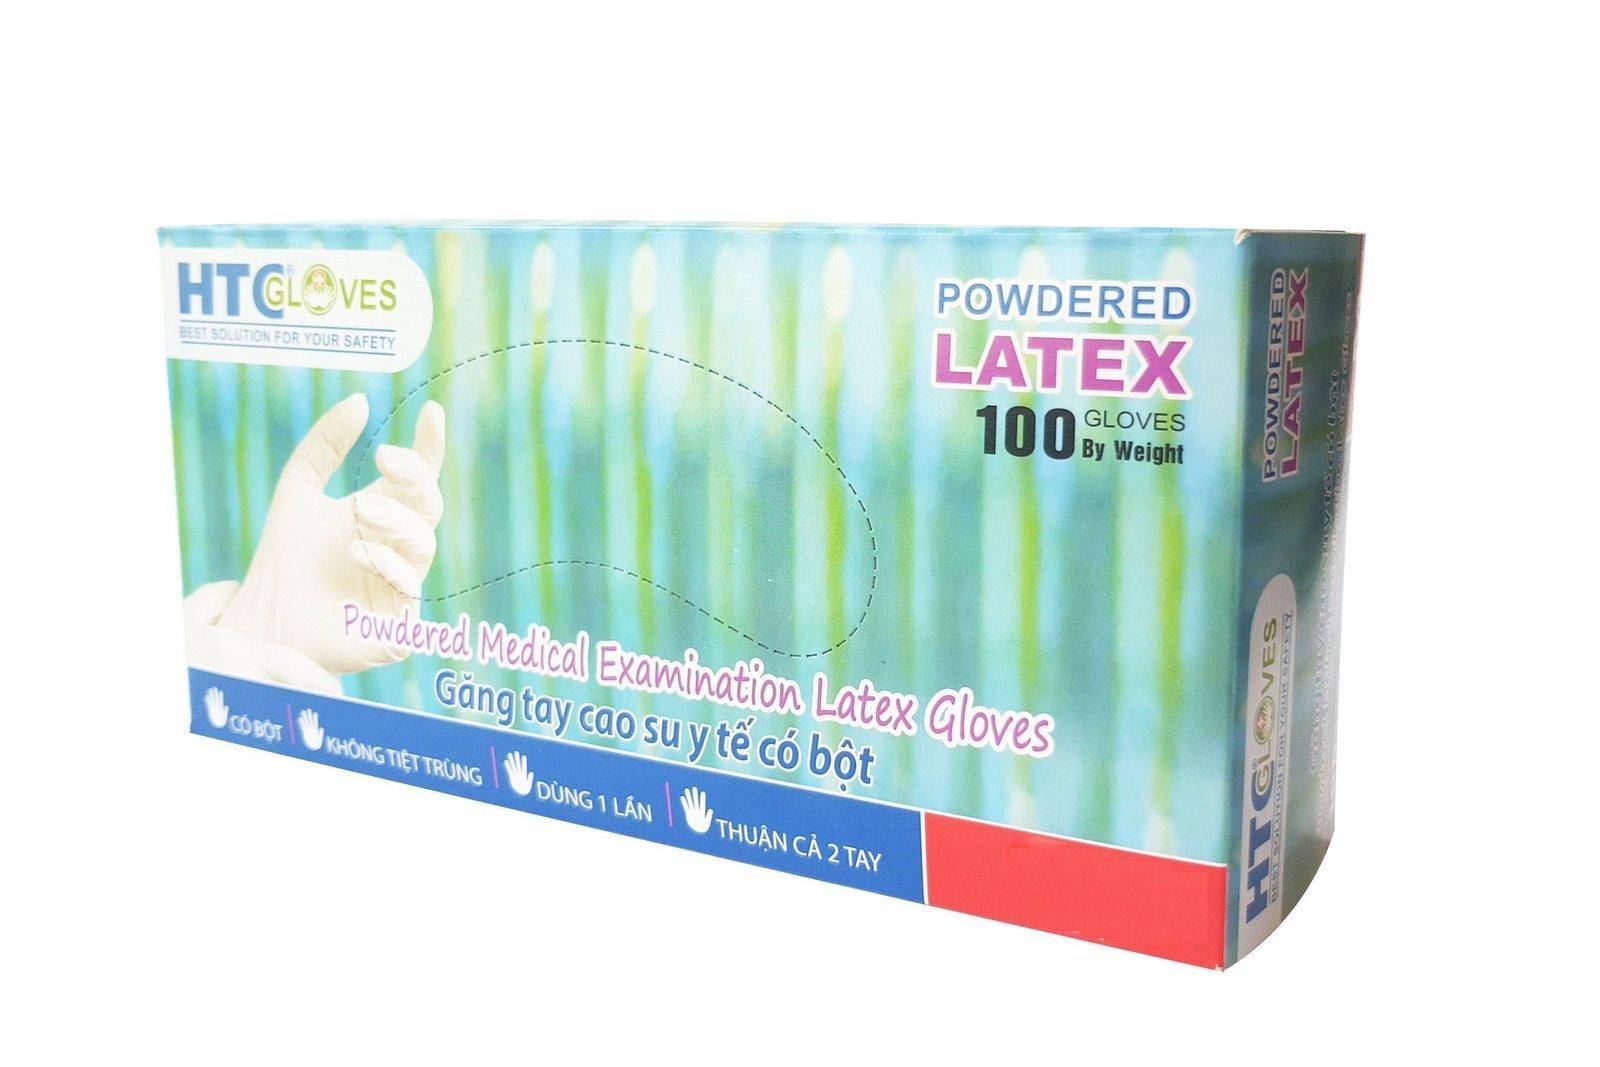 HTCGloves Medical Handschuhe Latex Pulver Größe S 100 Stck